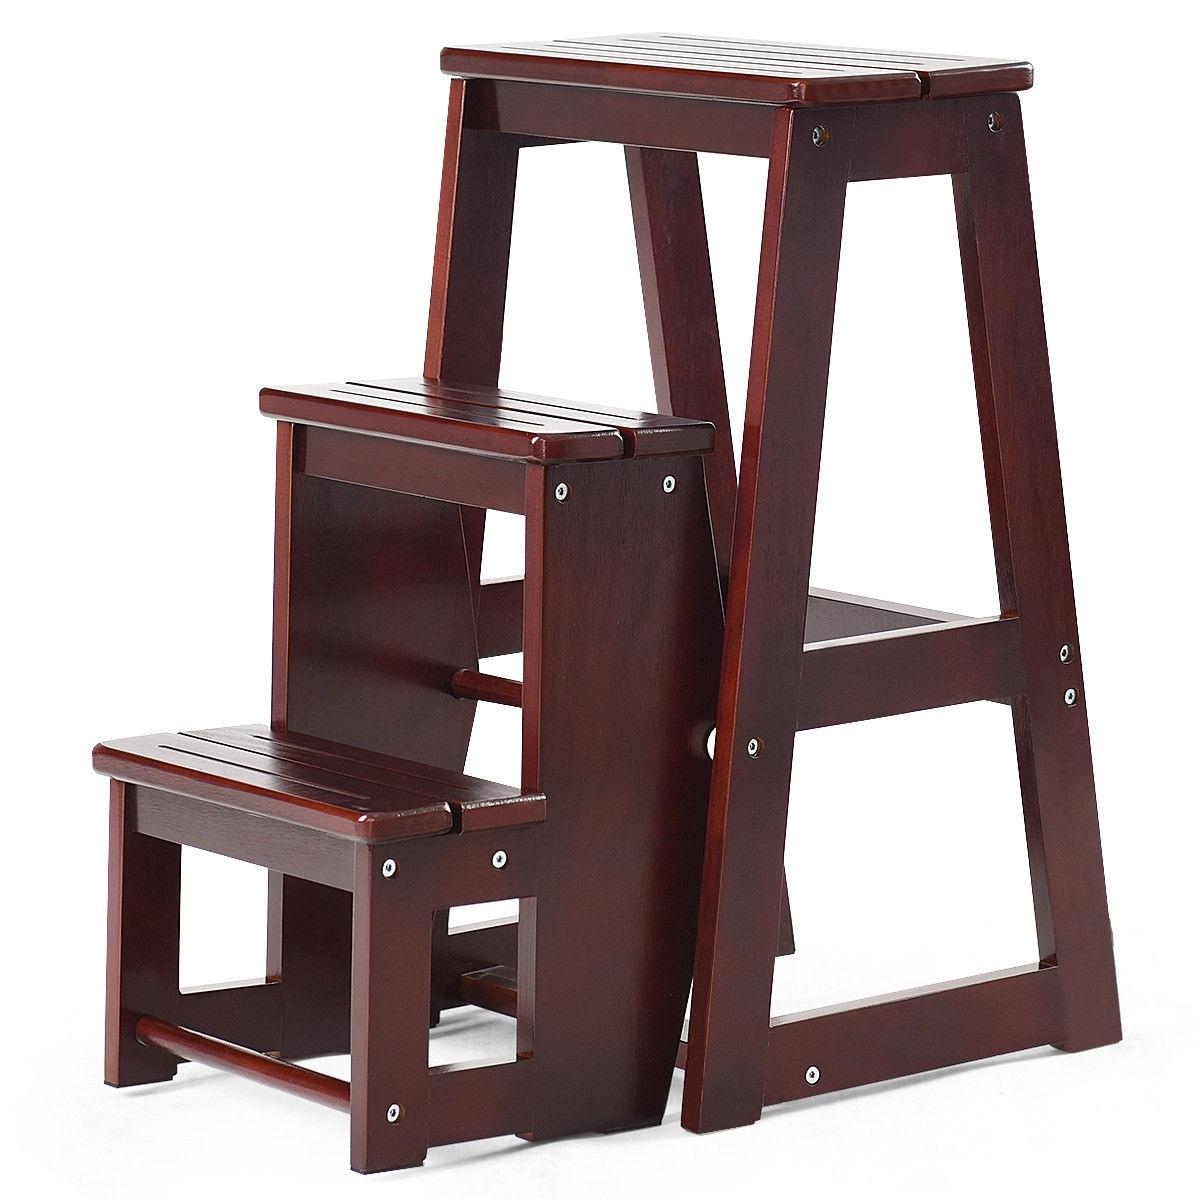 Sensational 5 Steps Wooden Ladder Chair Step Stool Multifunction Machost Co Dining Chair Design Ideas Machostcouk